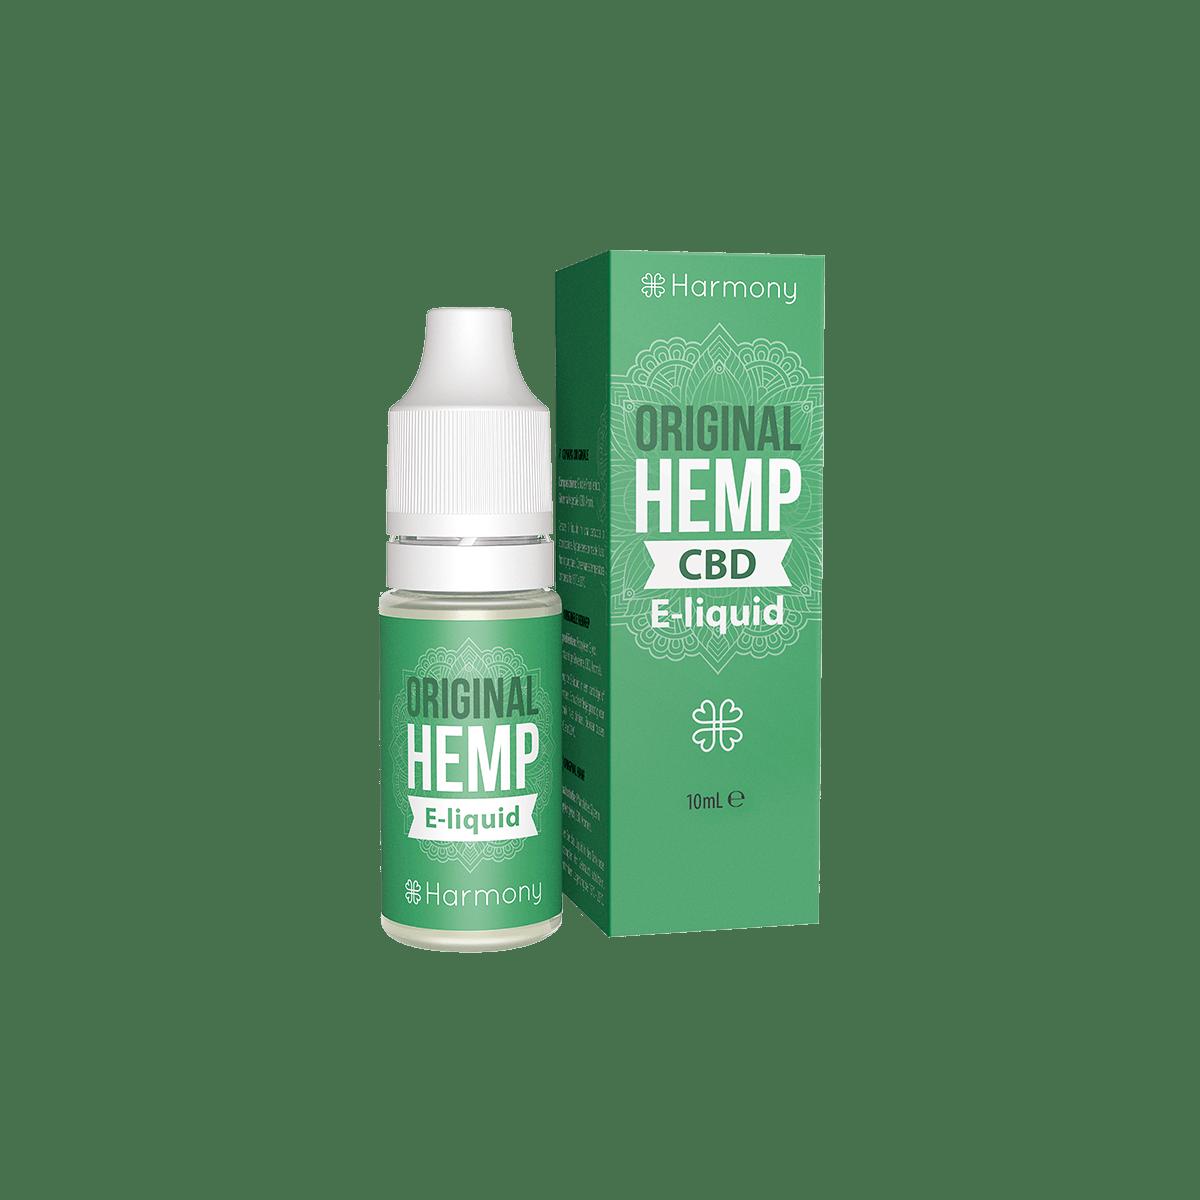 CBD Liquid | HARMONY Original Hemp | Menge 10 ml - 30 mg